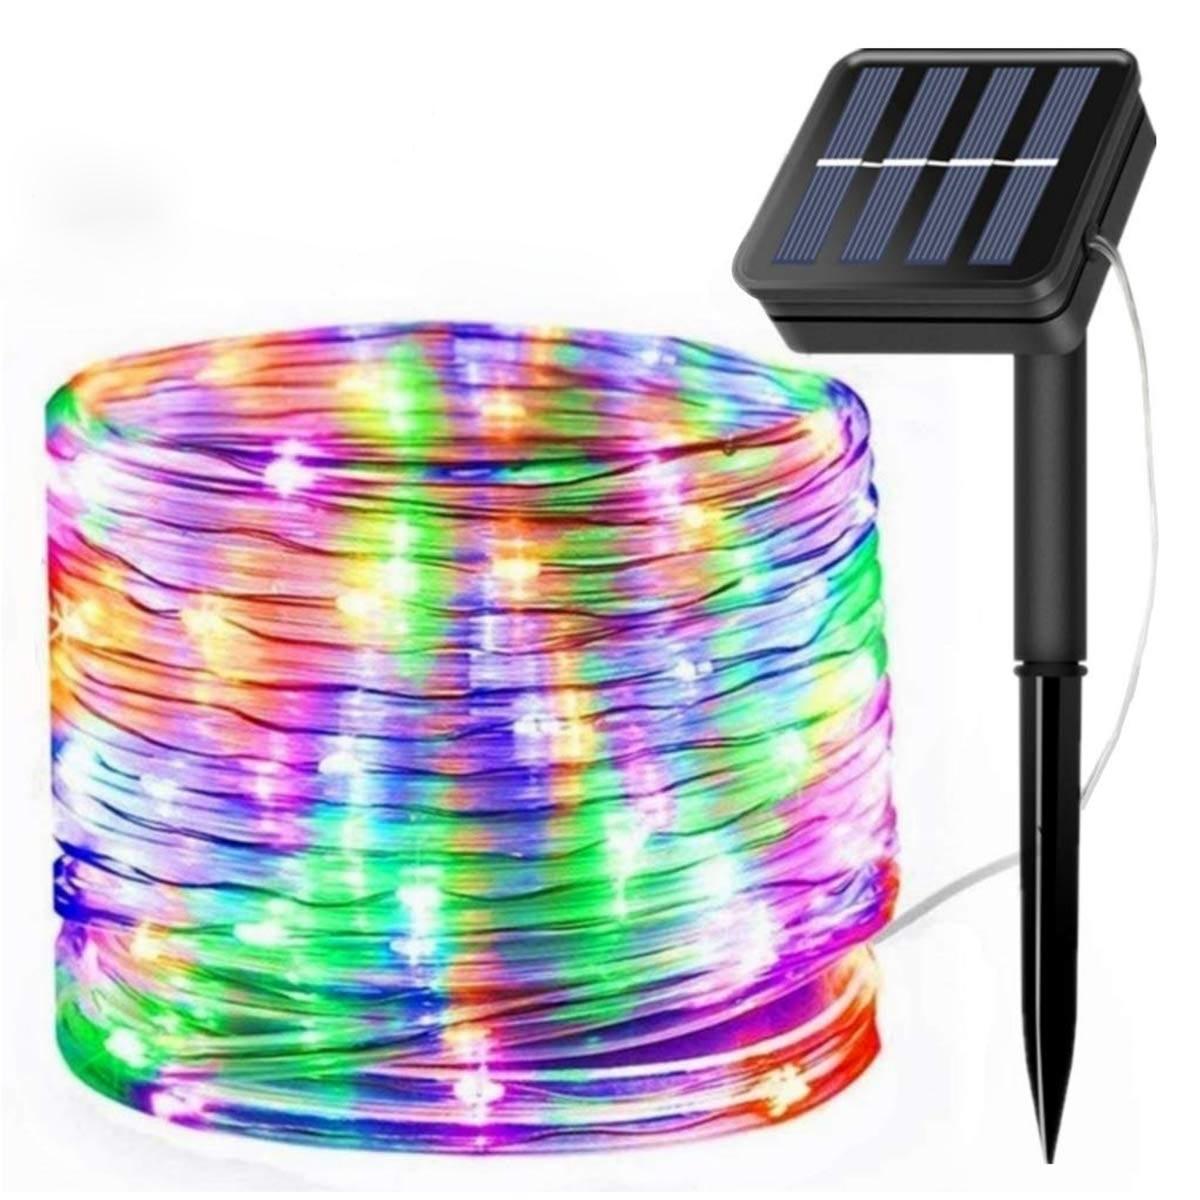 50/100/200 ledes cuerda Solar cuerda luces impermeable alambre de cobre al aire libre tubo Hada luces para camino de jardín de Navidad